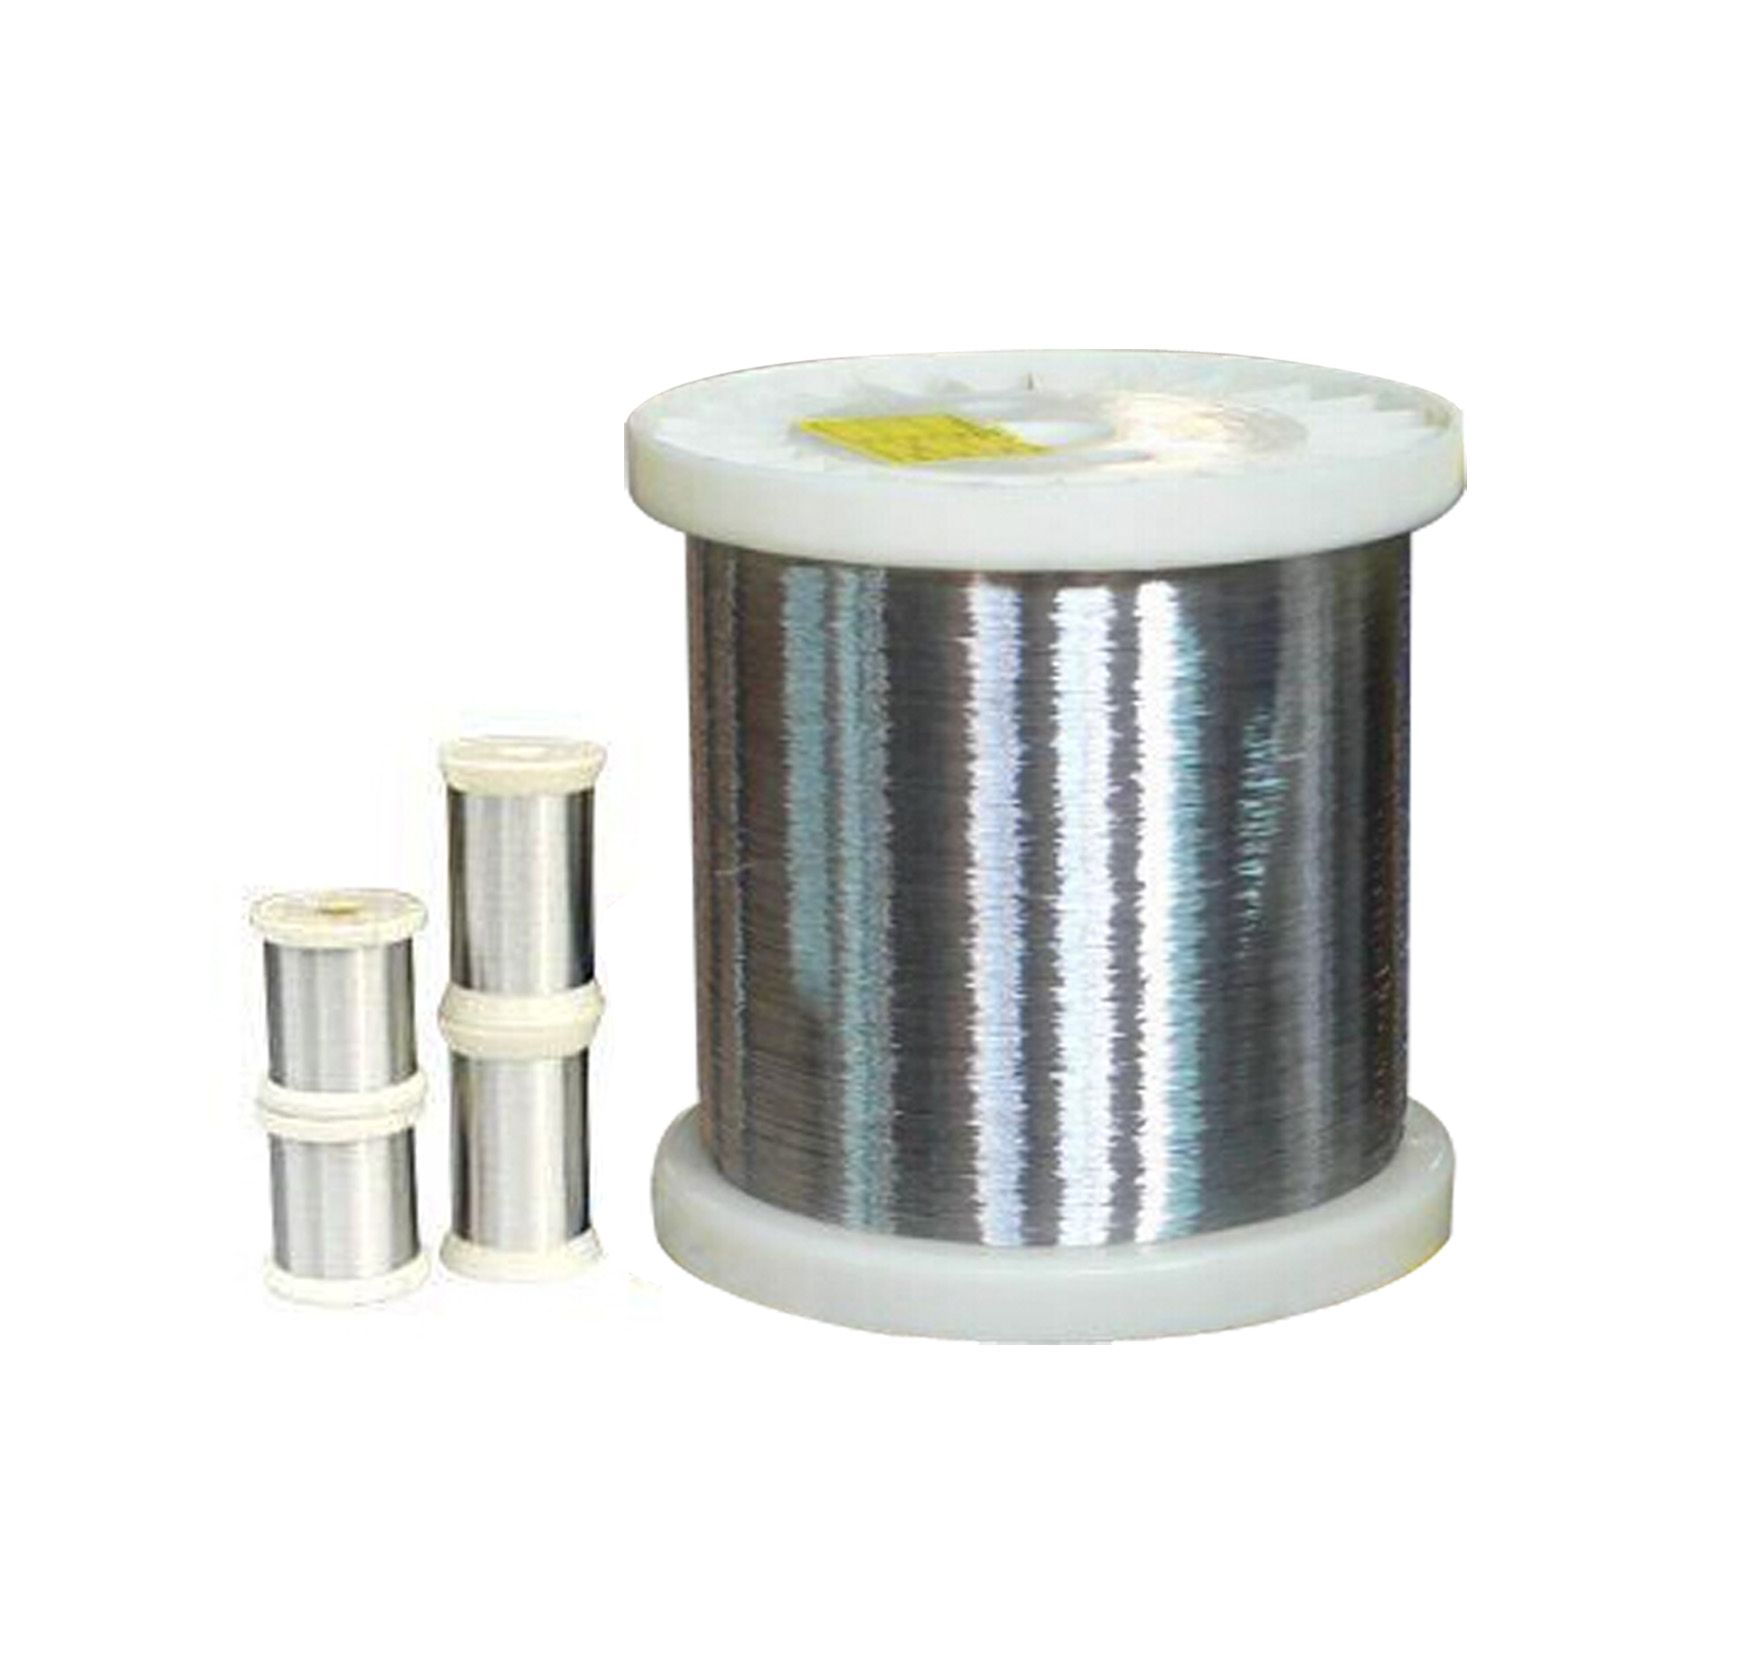 CuNi & CuMn alloy Description: JNL® Copper Nickel Alloy, Karma Alloy ...